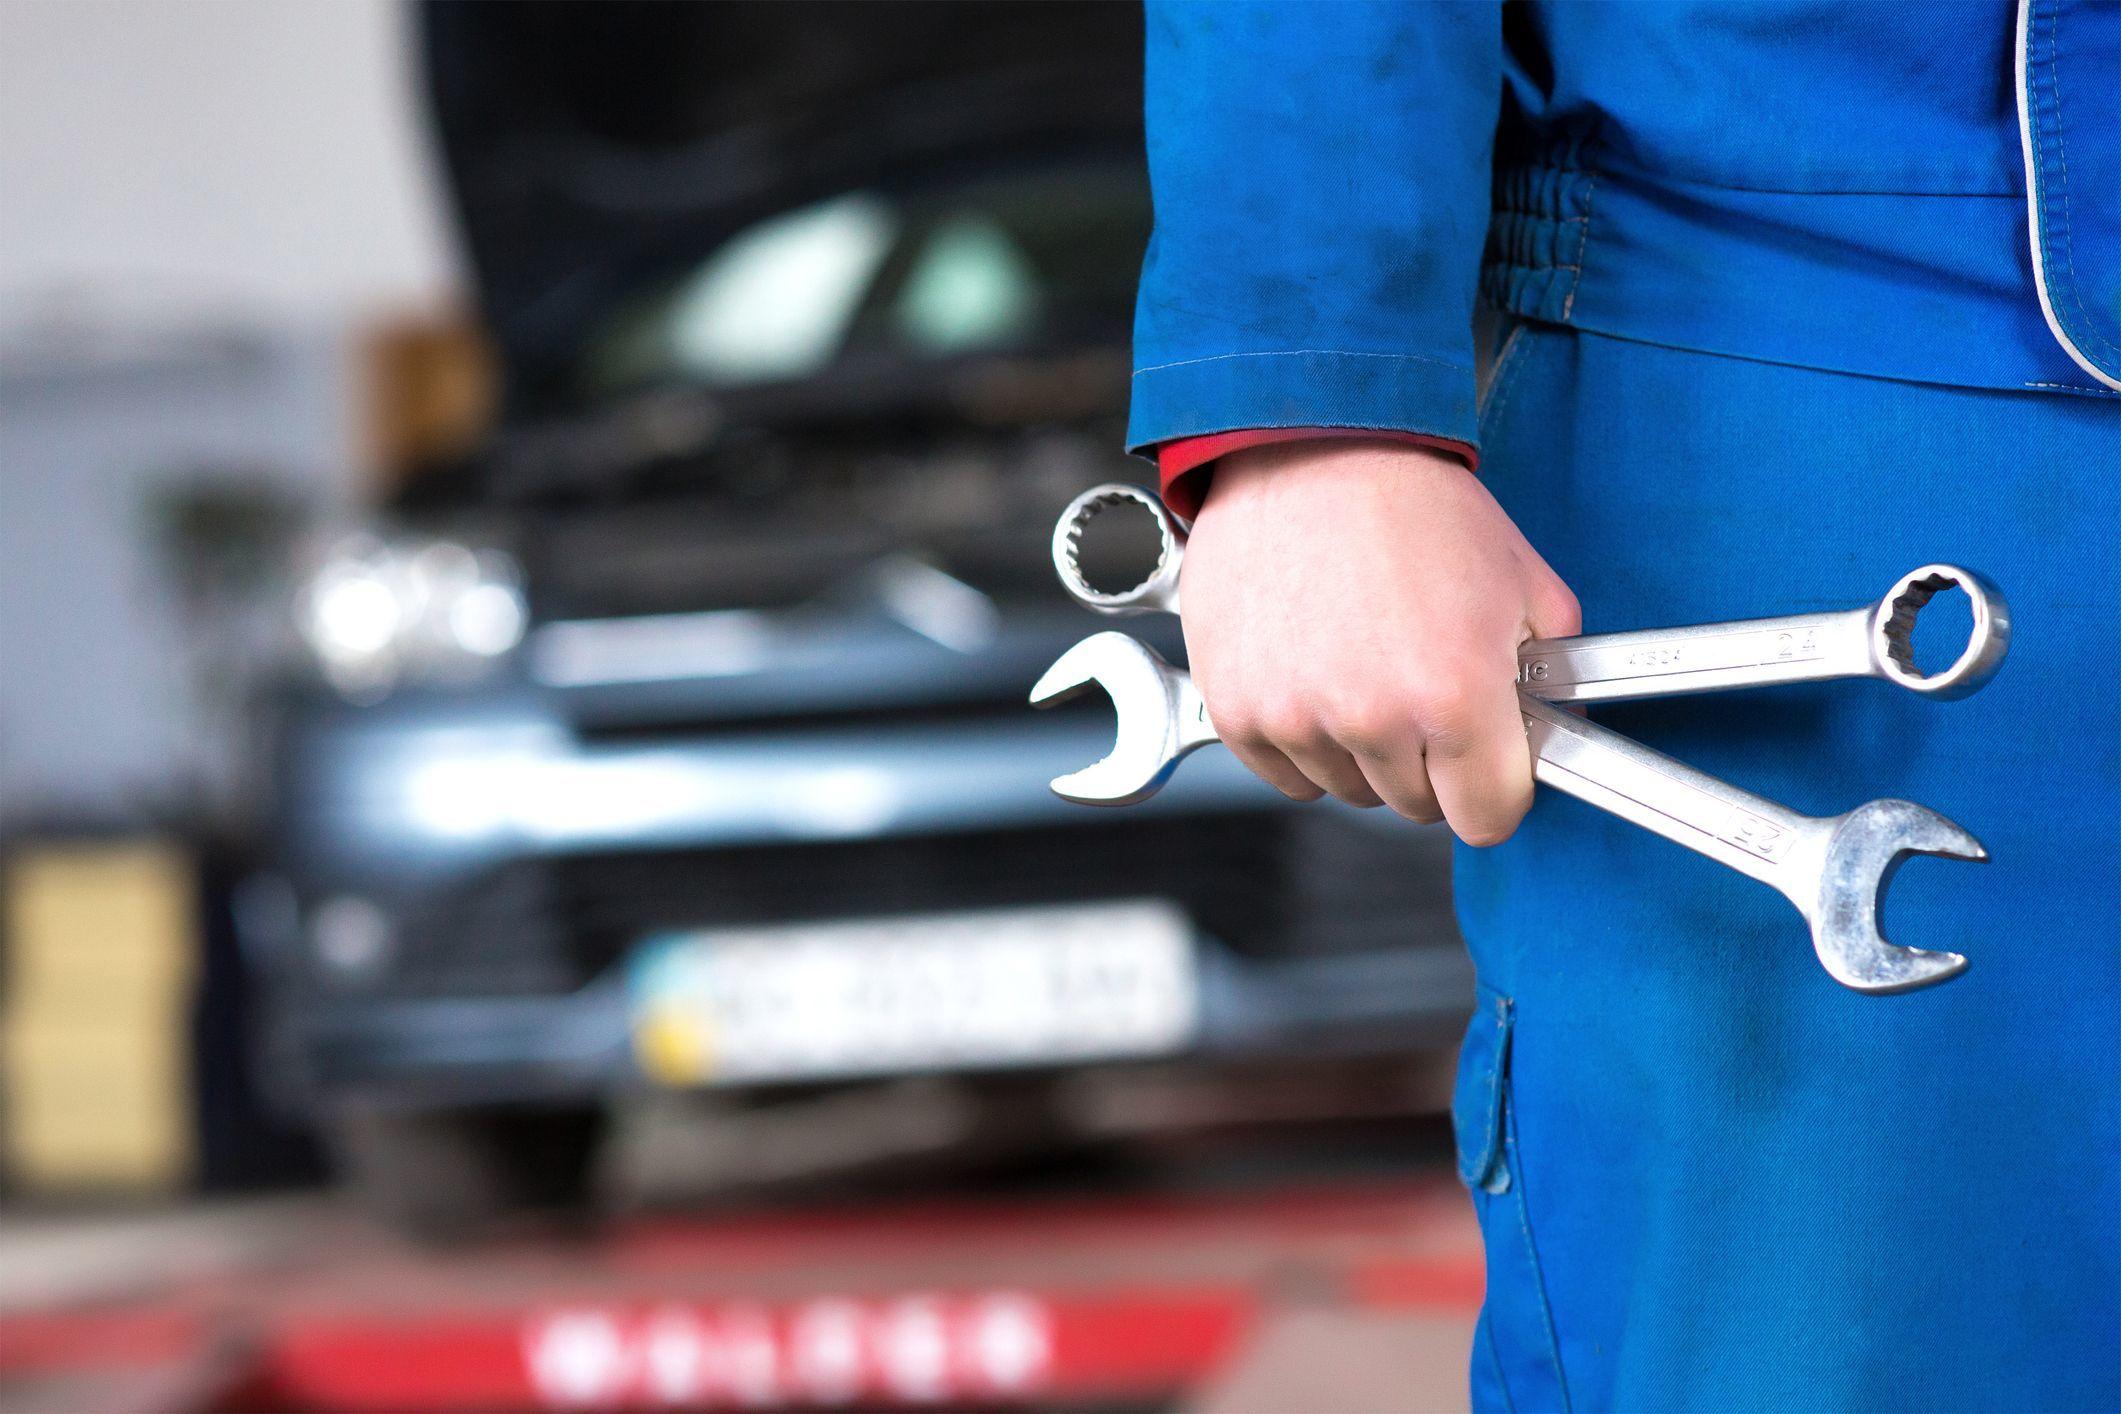 Michigan cracks down on unregistered auto repair shops.